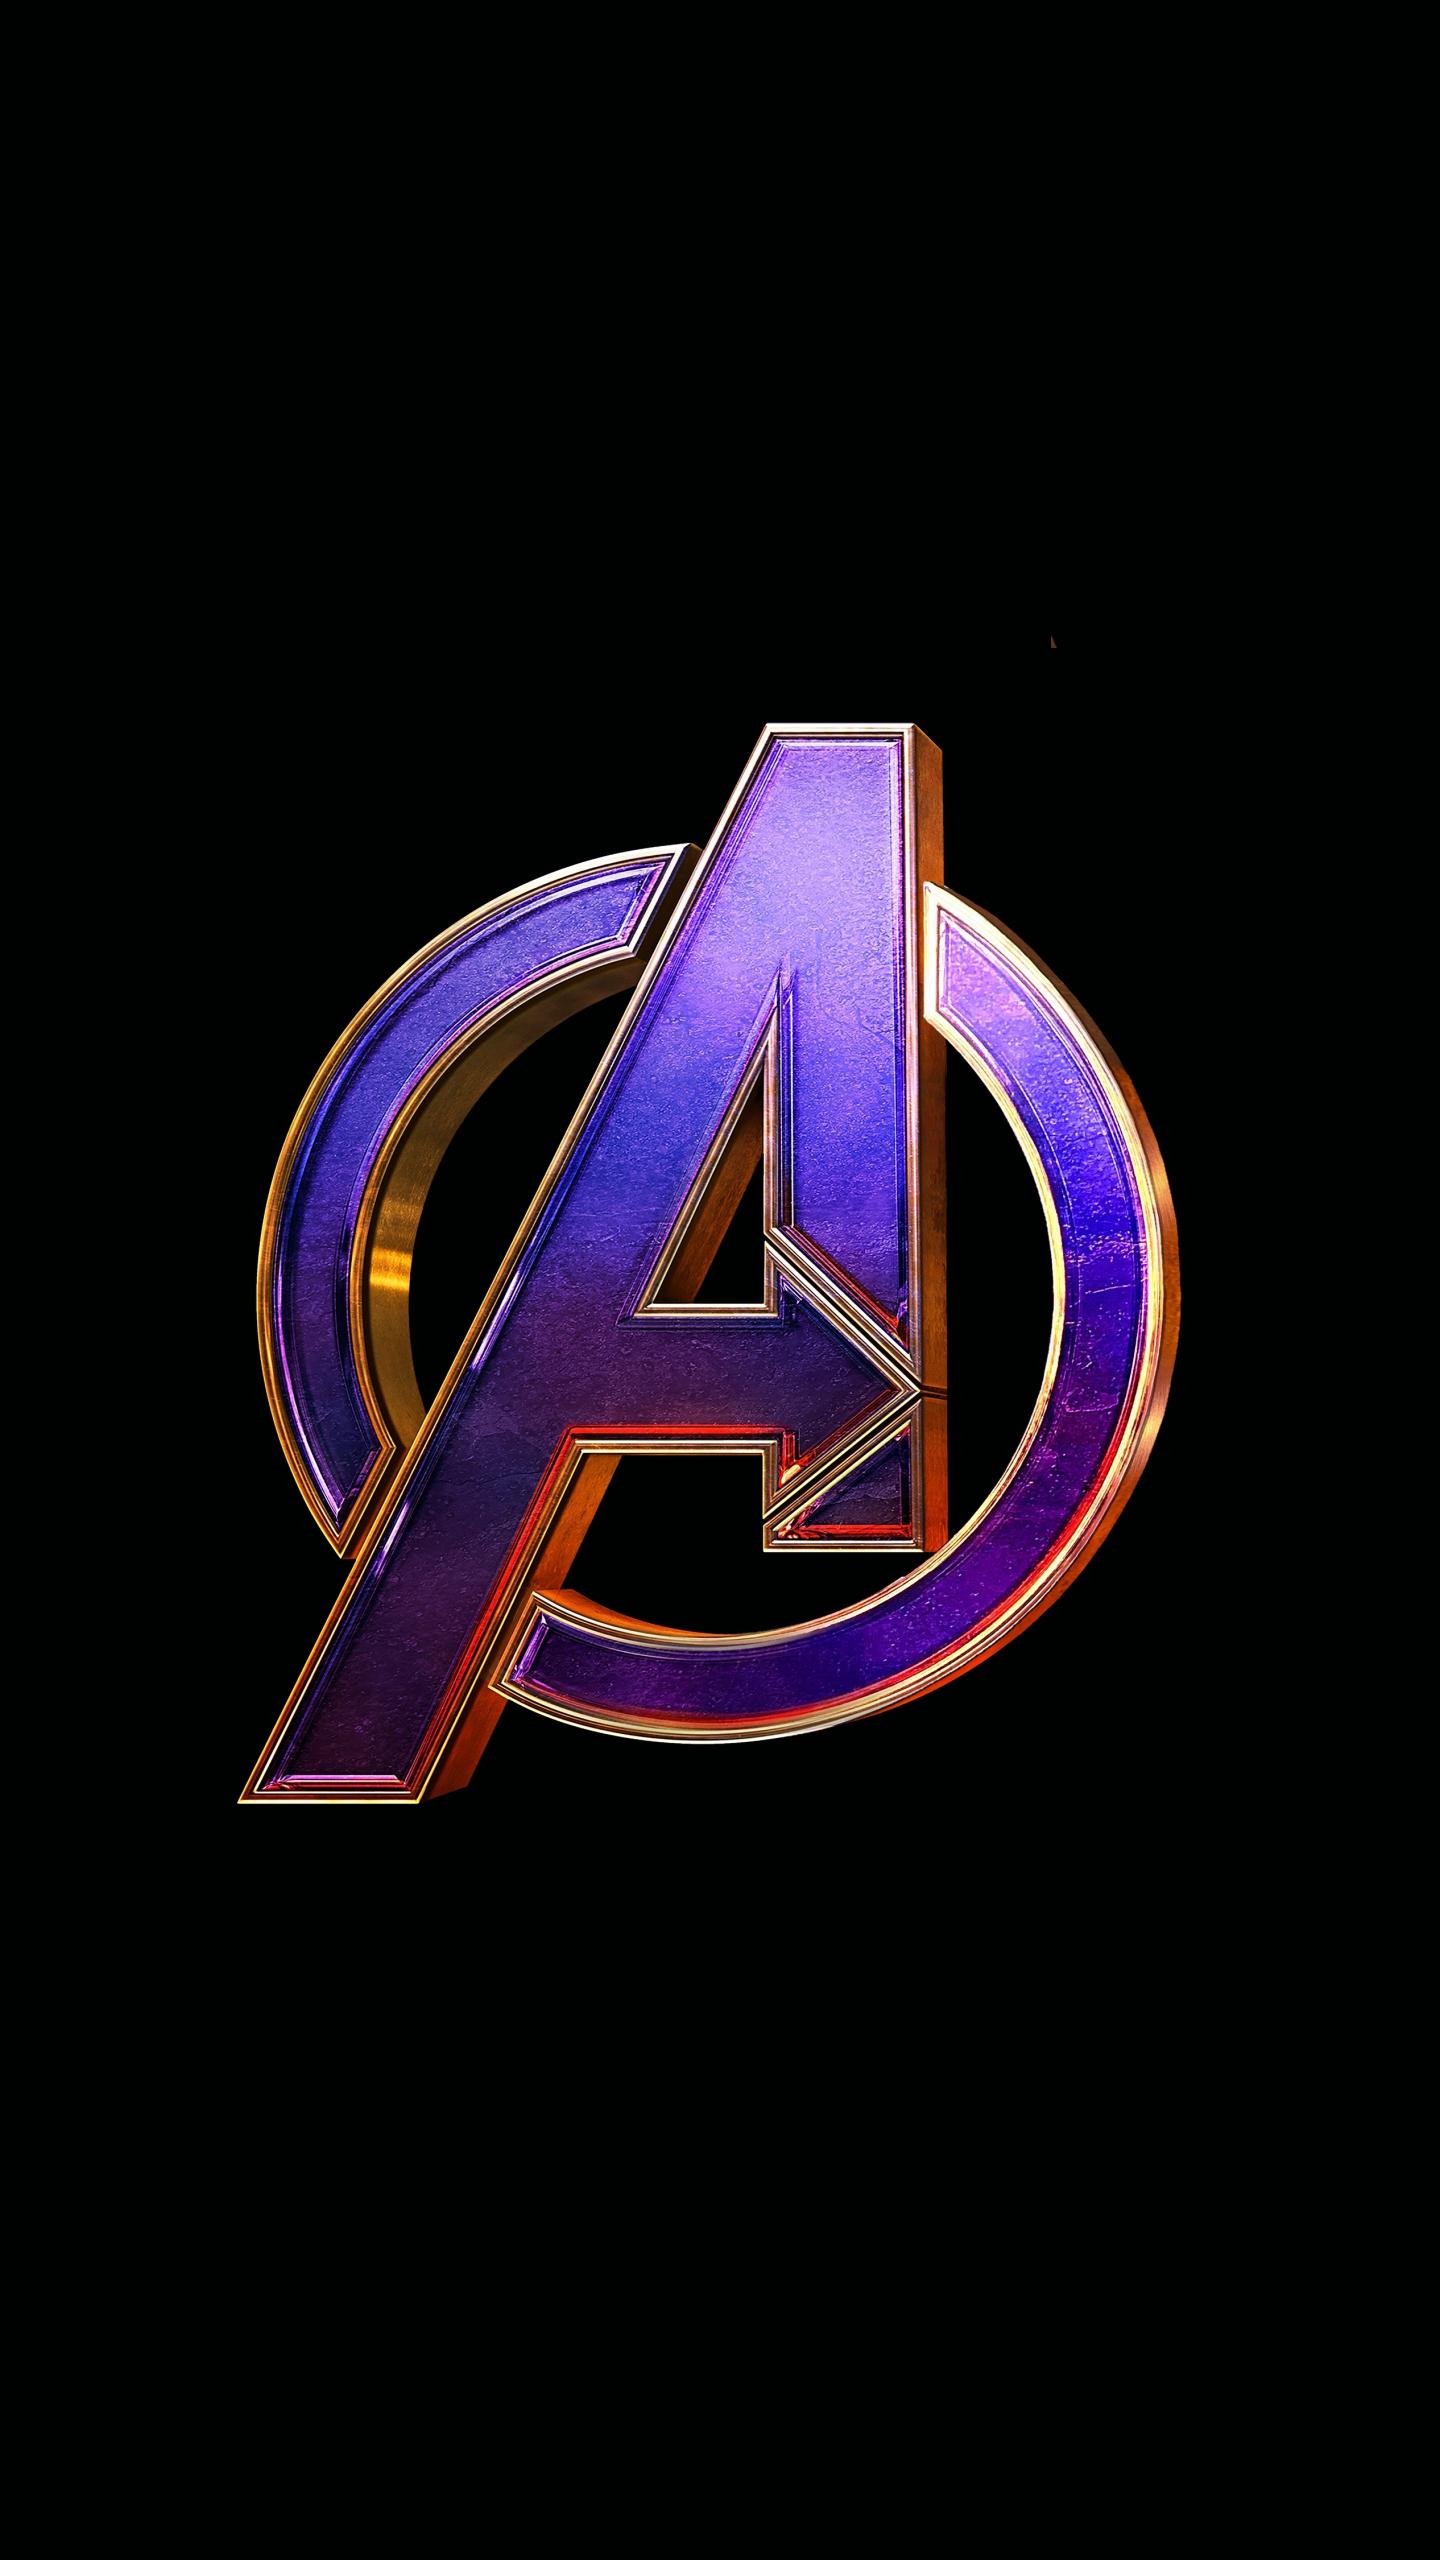 Download 1440x2560 Wallpaper Avengers Endgame Movie Logo Qhd Samsung Galaxy S6 S7 Edge Note Lg G4 1440x2560 Hd Image Background 20787